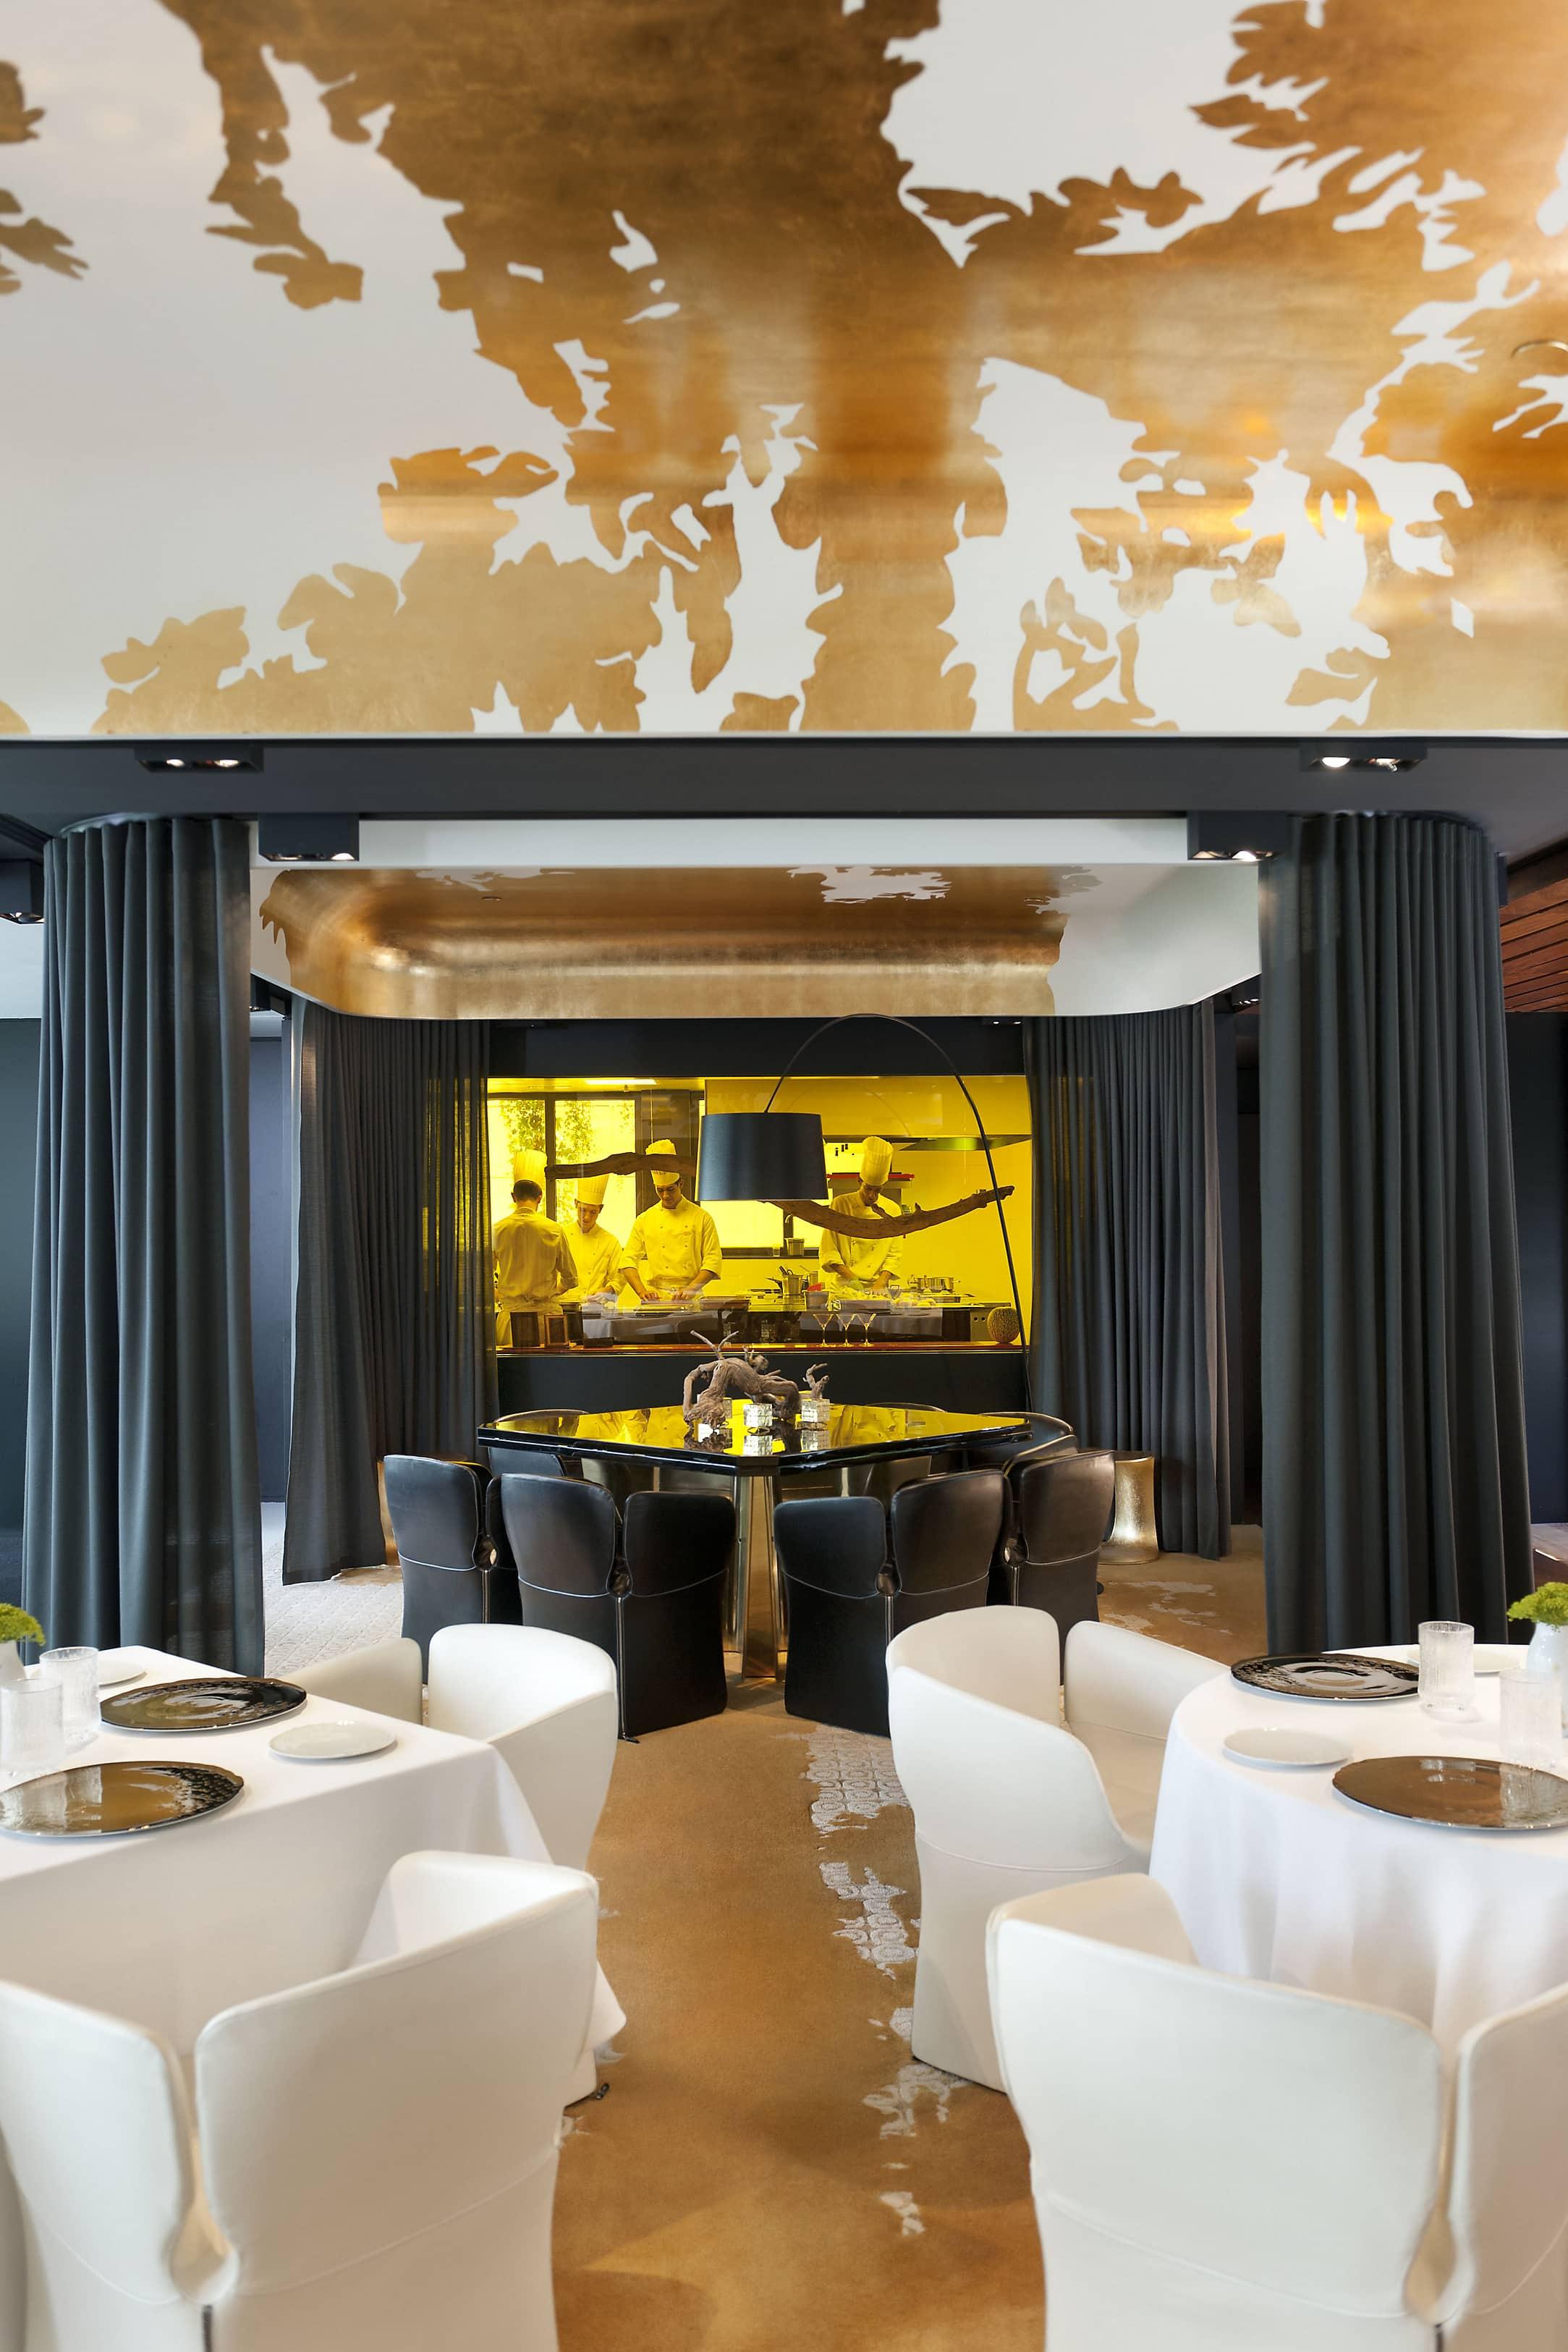 Barcelona hotel fotogalerie mandarin oriental hotel barcelona - Hotel mandarin restaurante ...